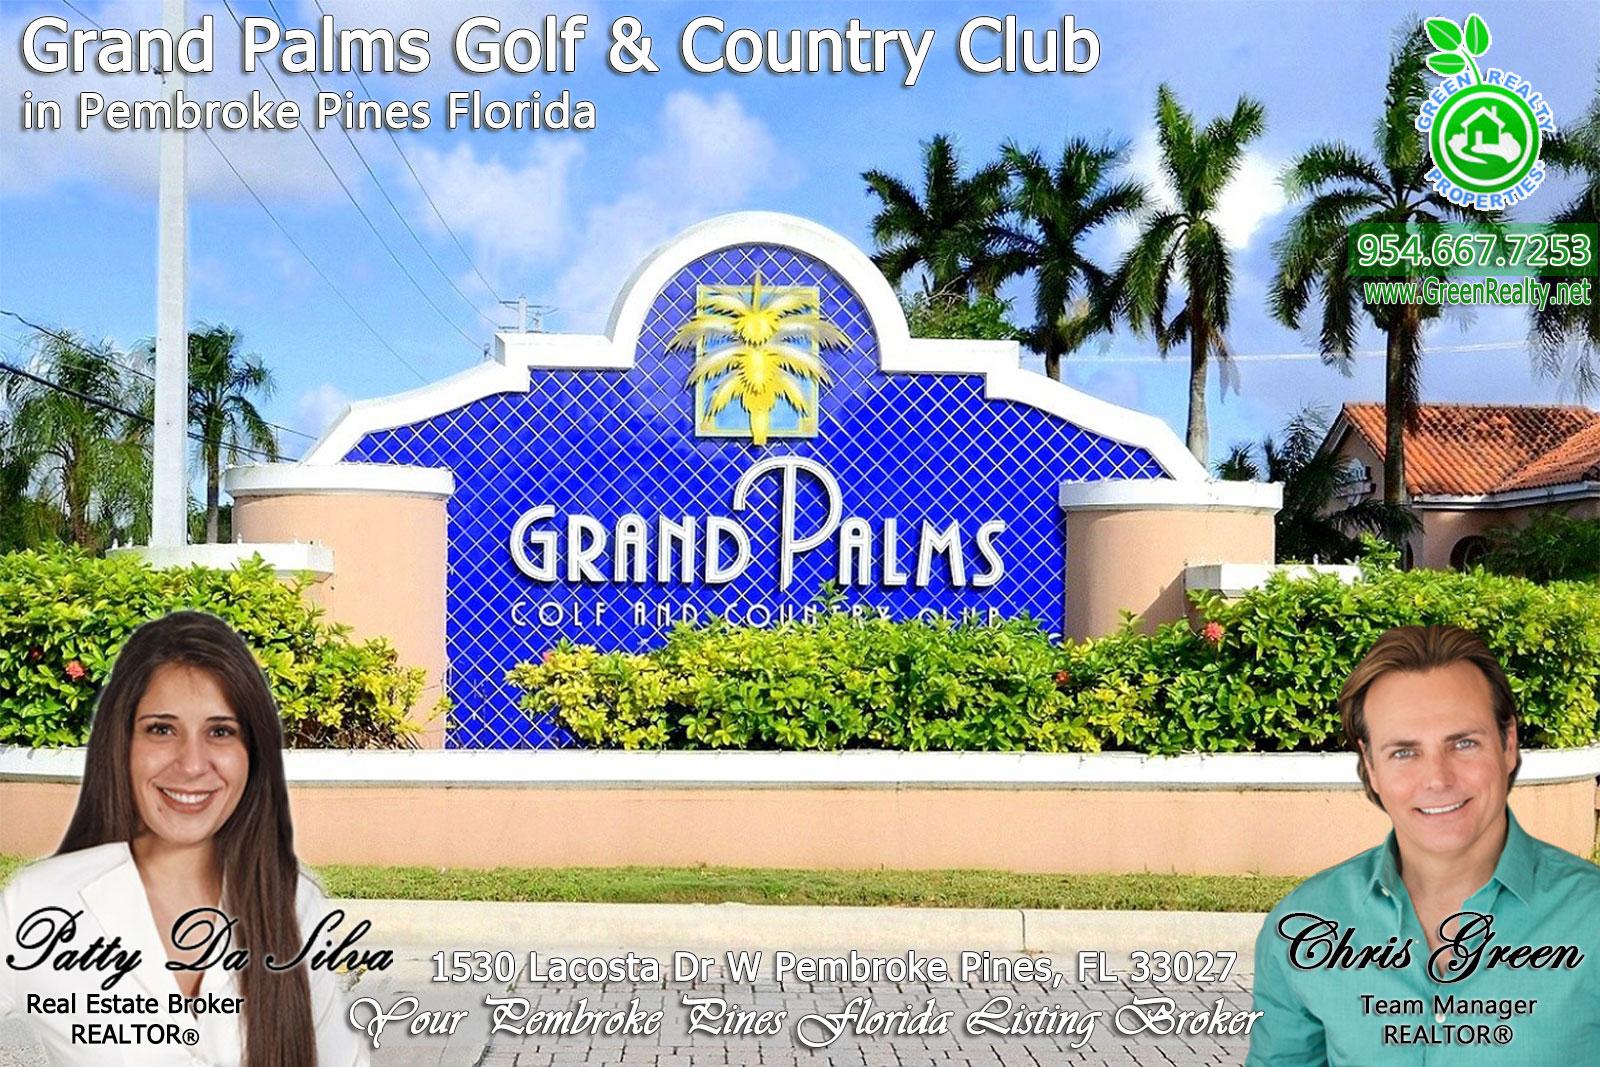 Real-Estate-For-Sale-Grand-Palms-Pembroke-Pines